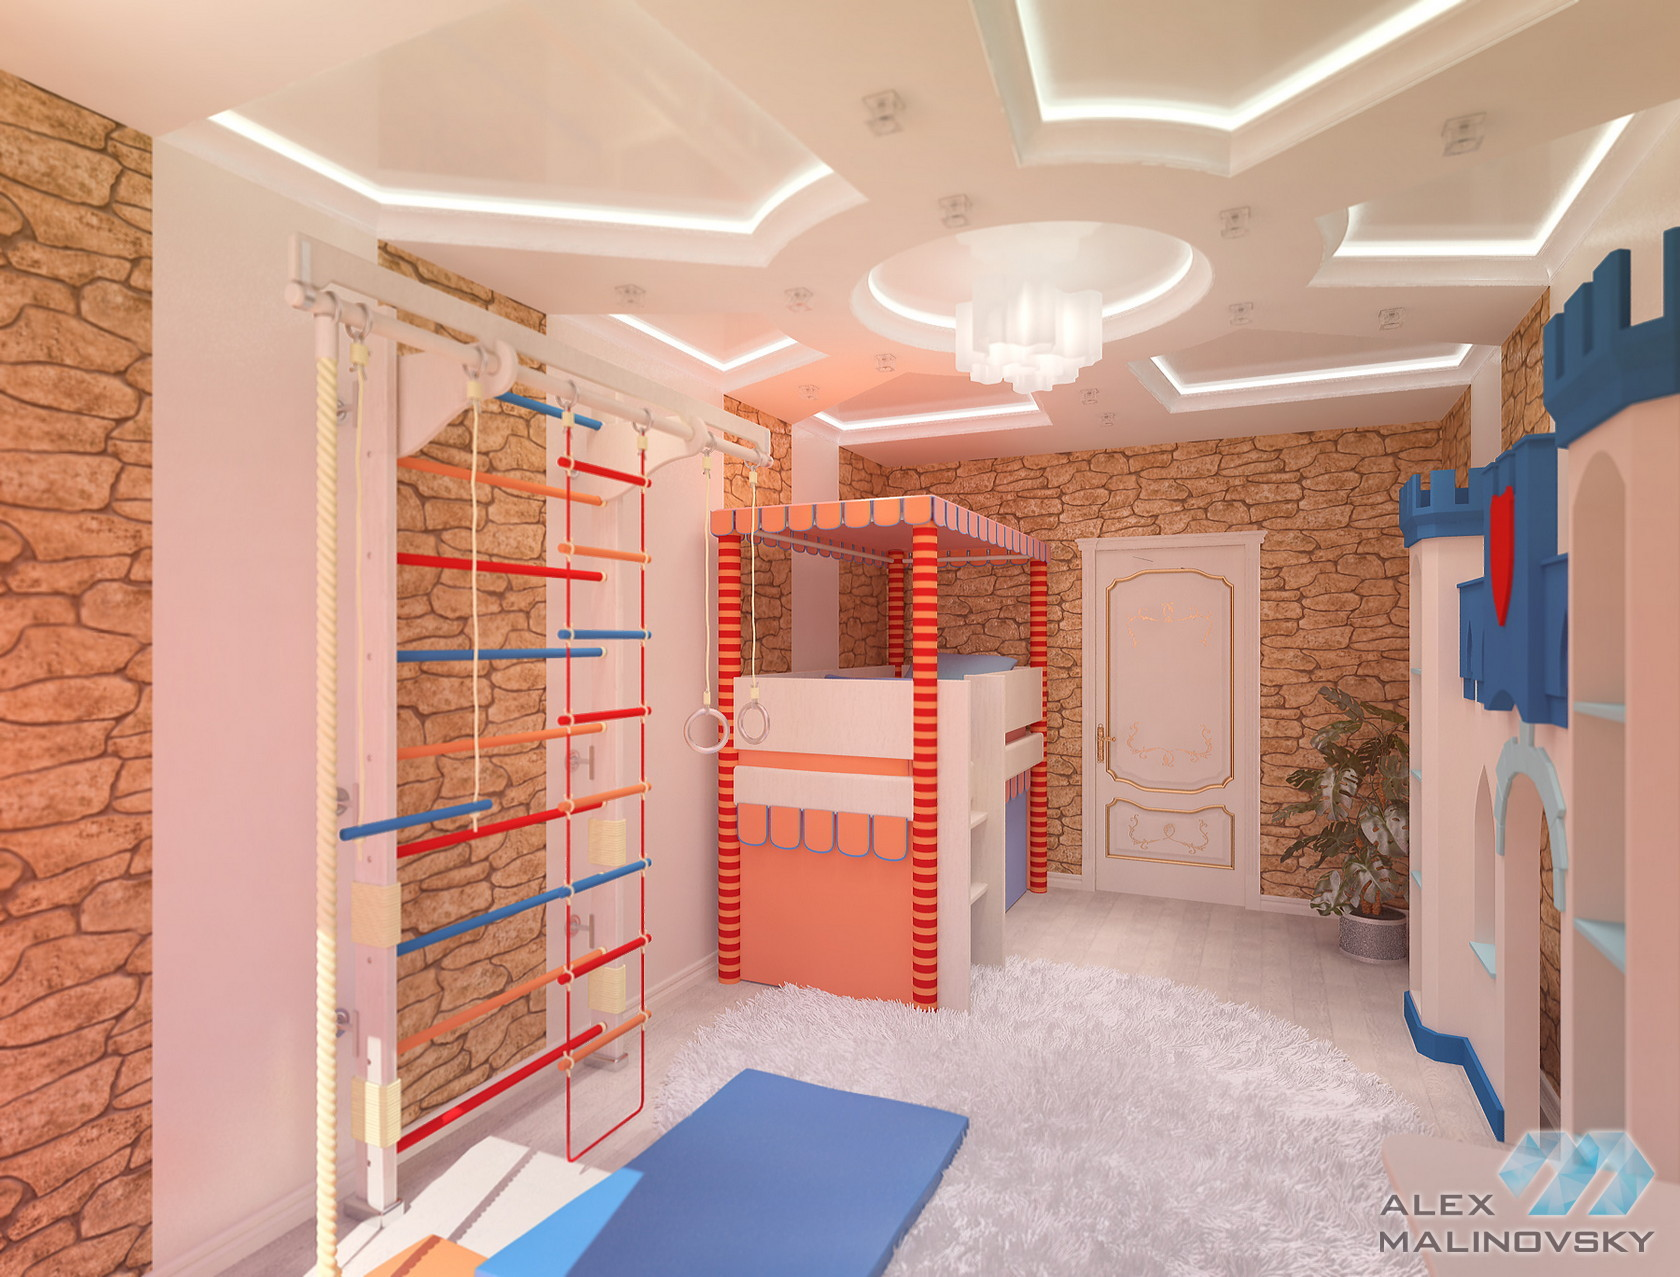 Детская 2, 4х комнатная квартира, ЖК Парус, СПб